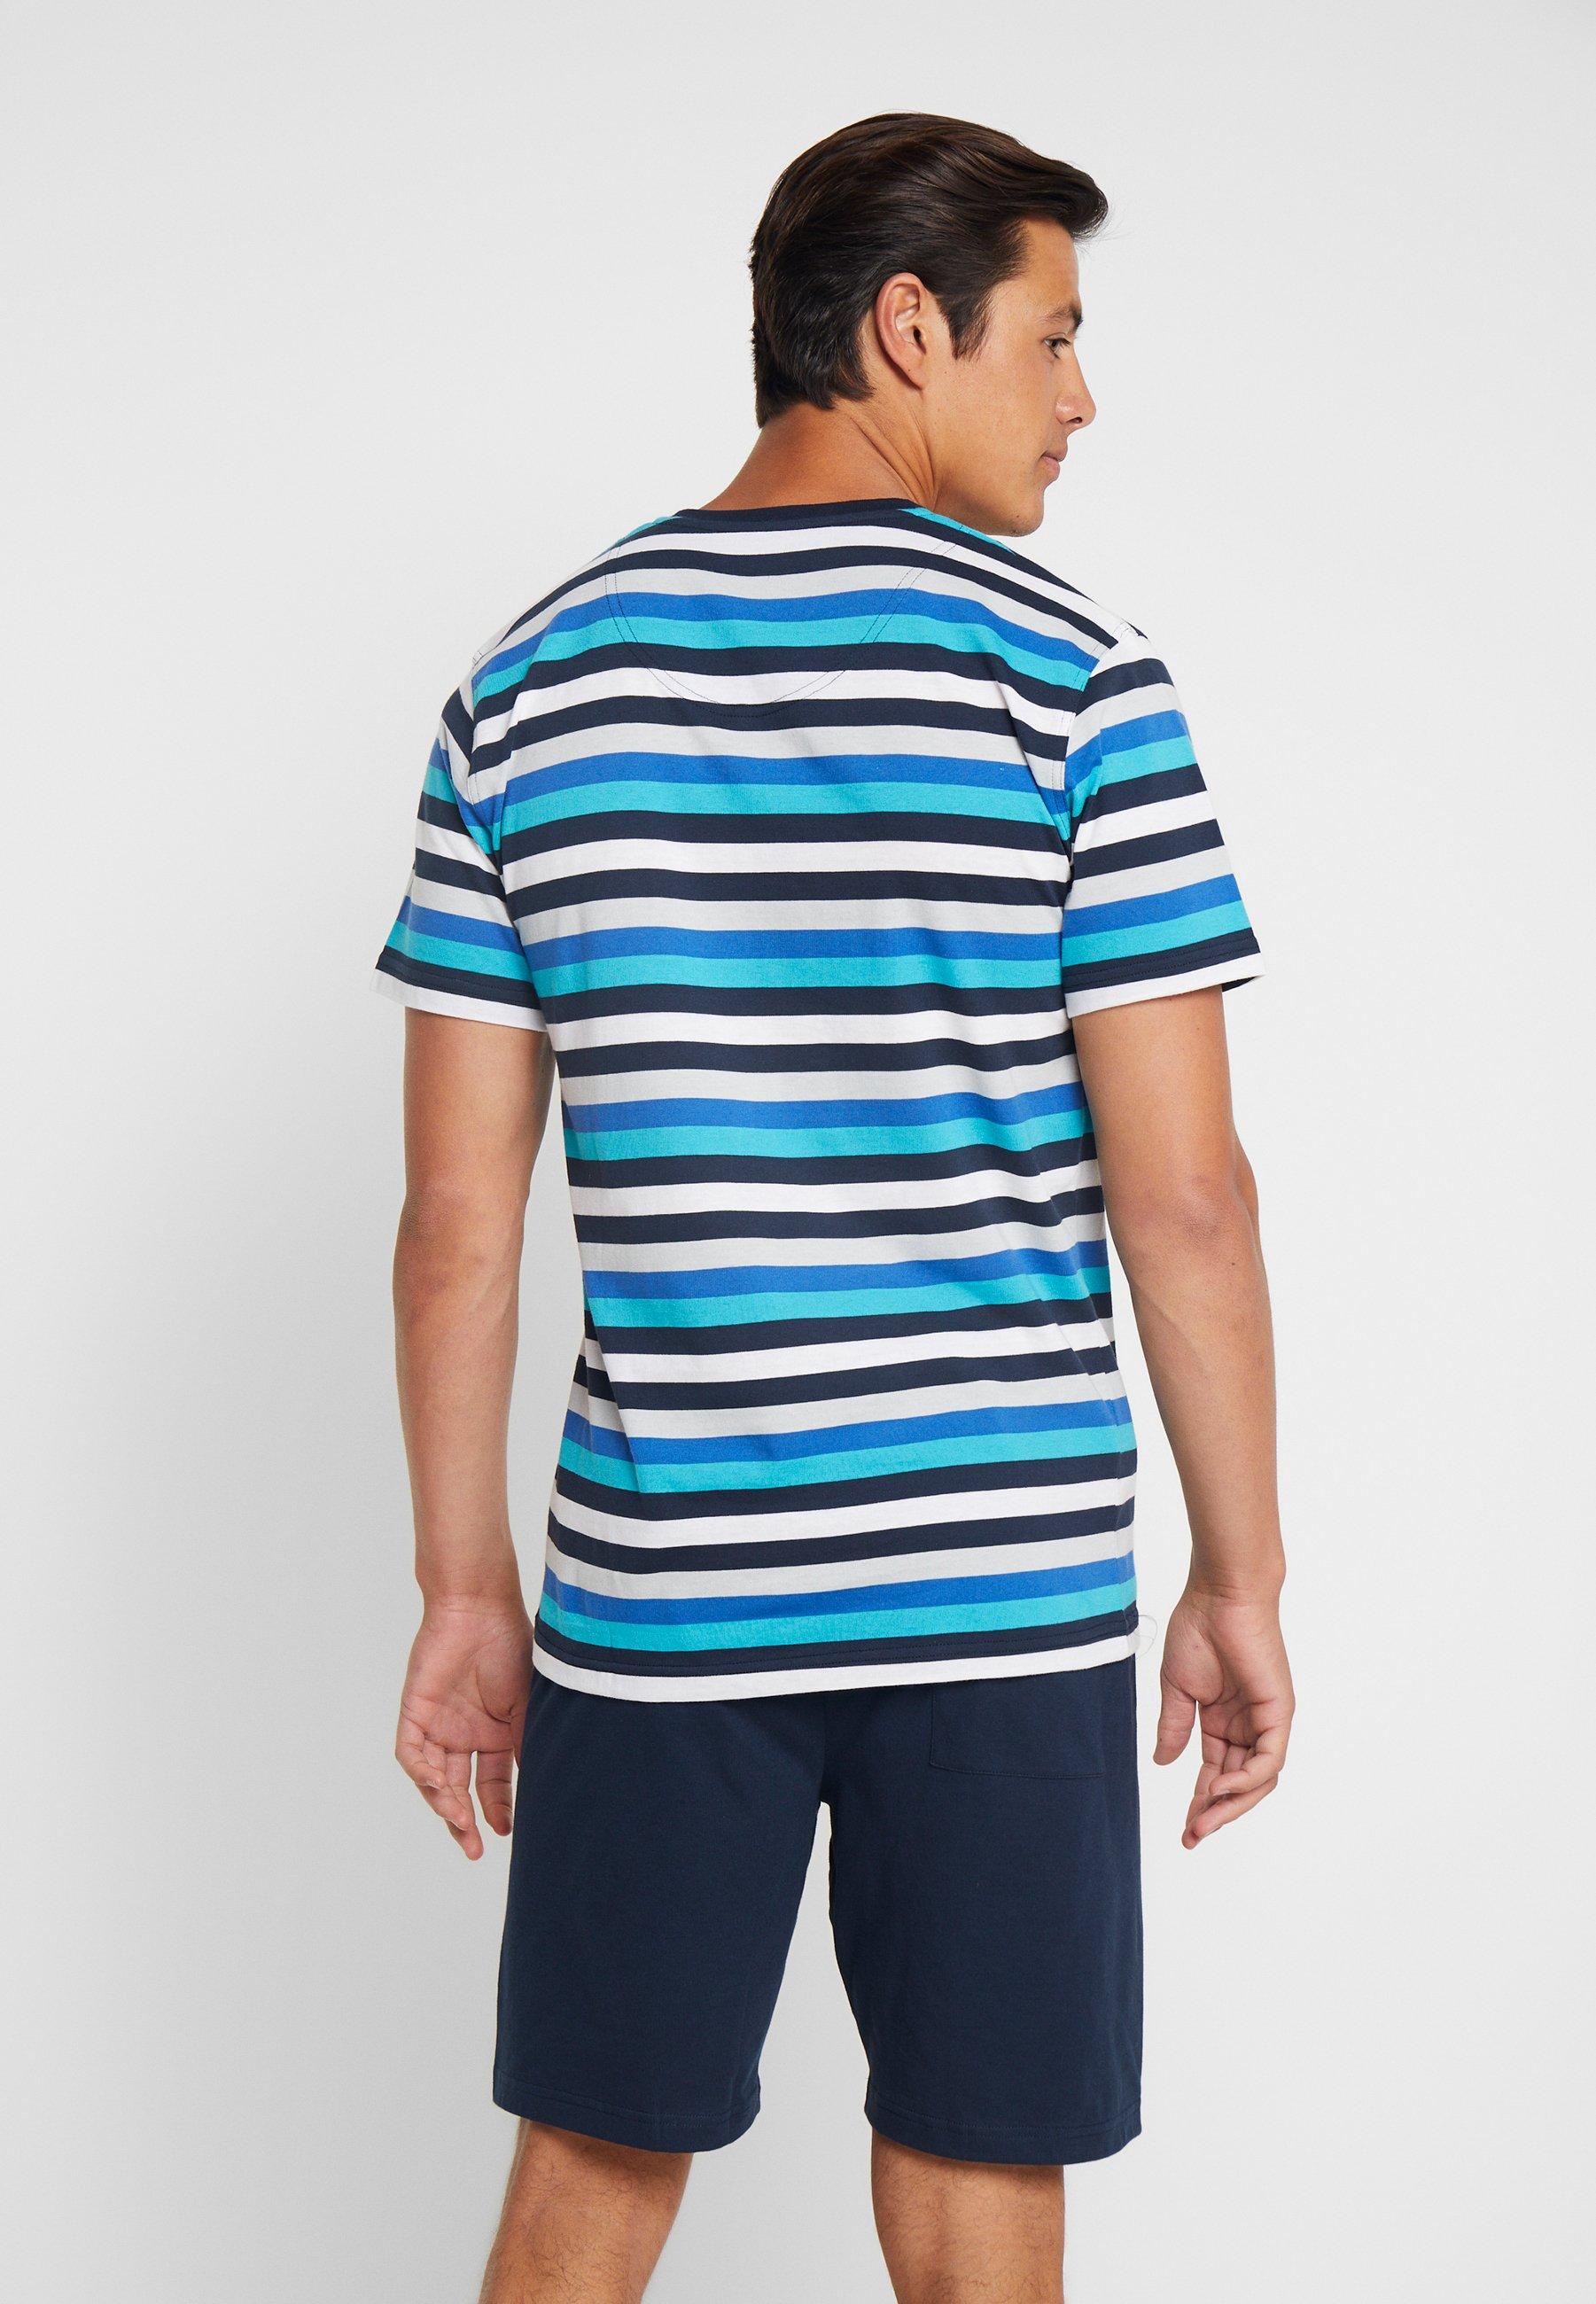 neckPyjama Shorty V Light Ceceba Blue cTFKl1J